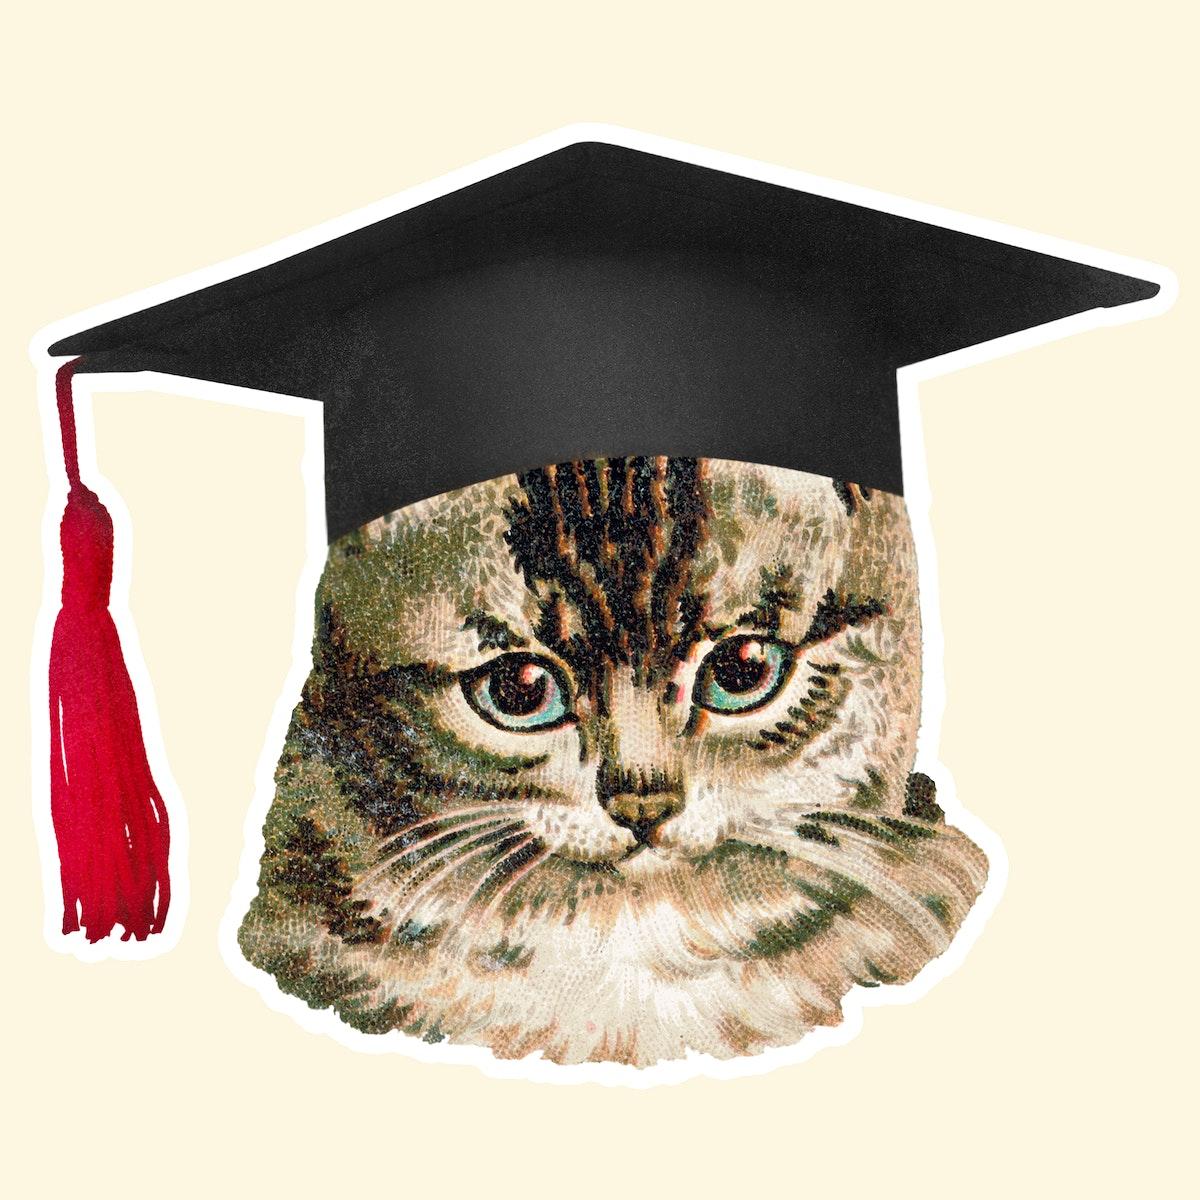 Cat in a graduation cap sticker illustration